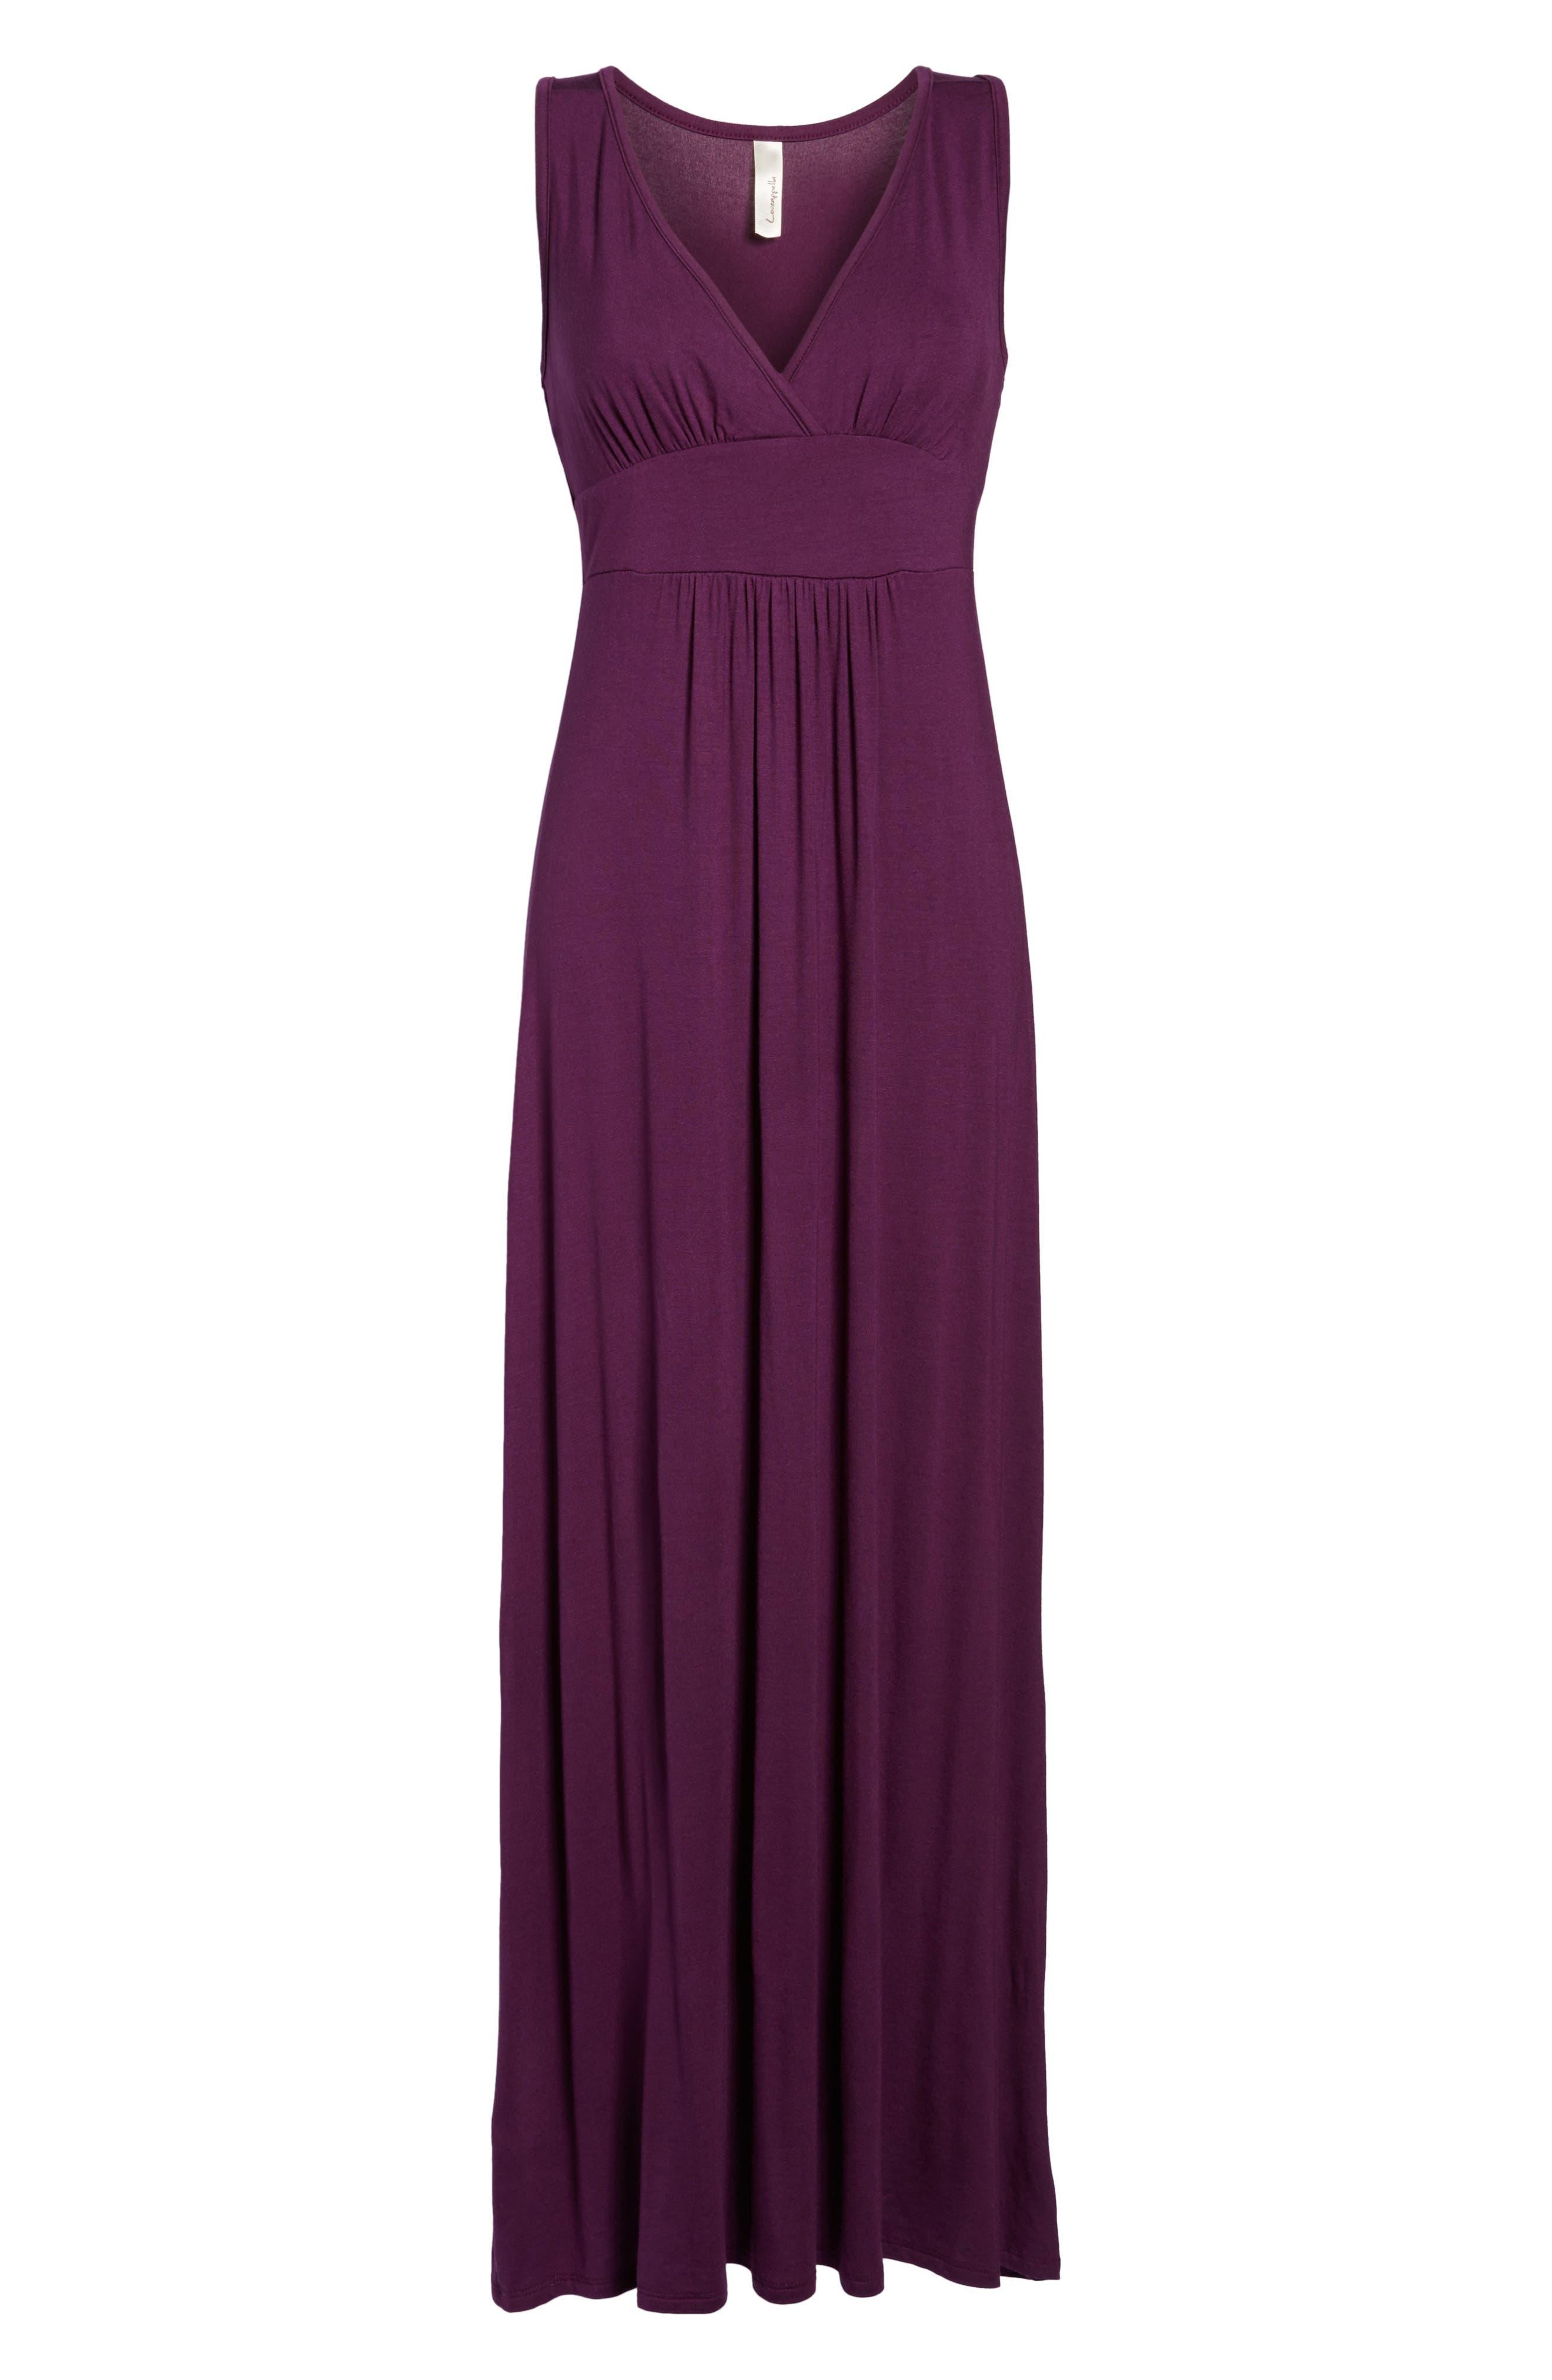 LOVEAPPELLA, V-Neck Jersey Maxi Dress, Alternate thumbnail 7, color, PURPLE DARK